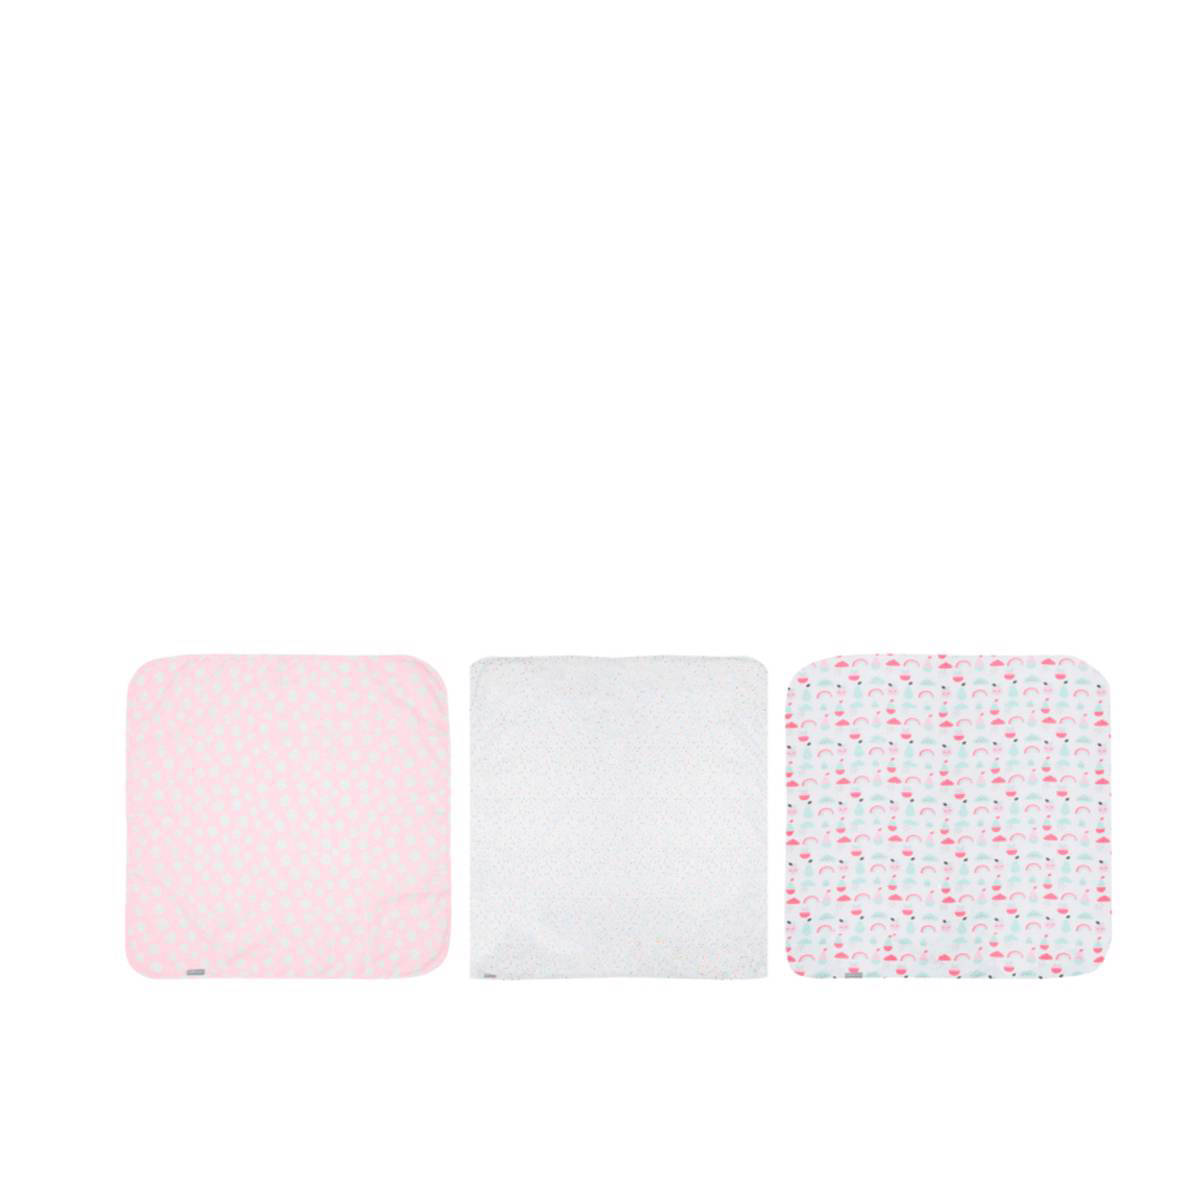 bébé-jou Blush Baby hydrofiele doeken 70x70 cm (3 stuks)